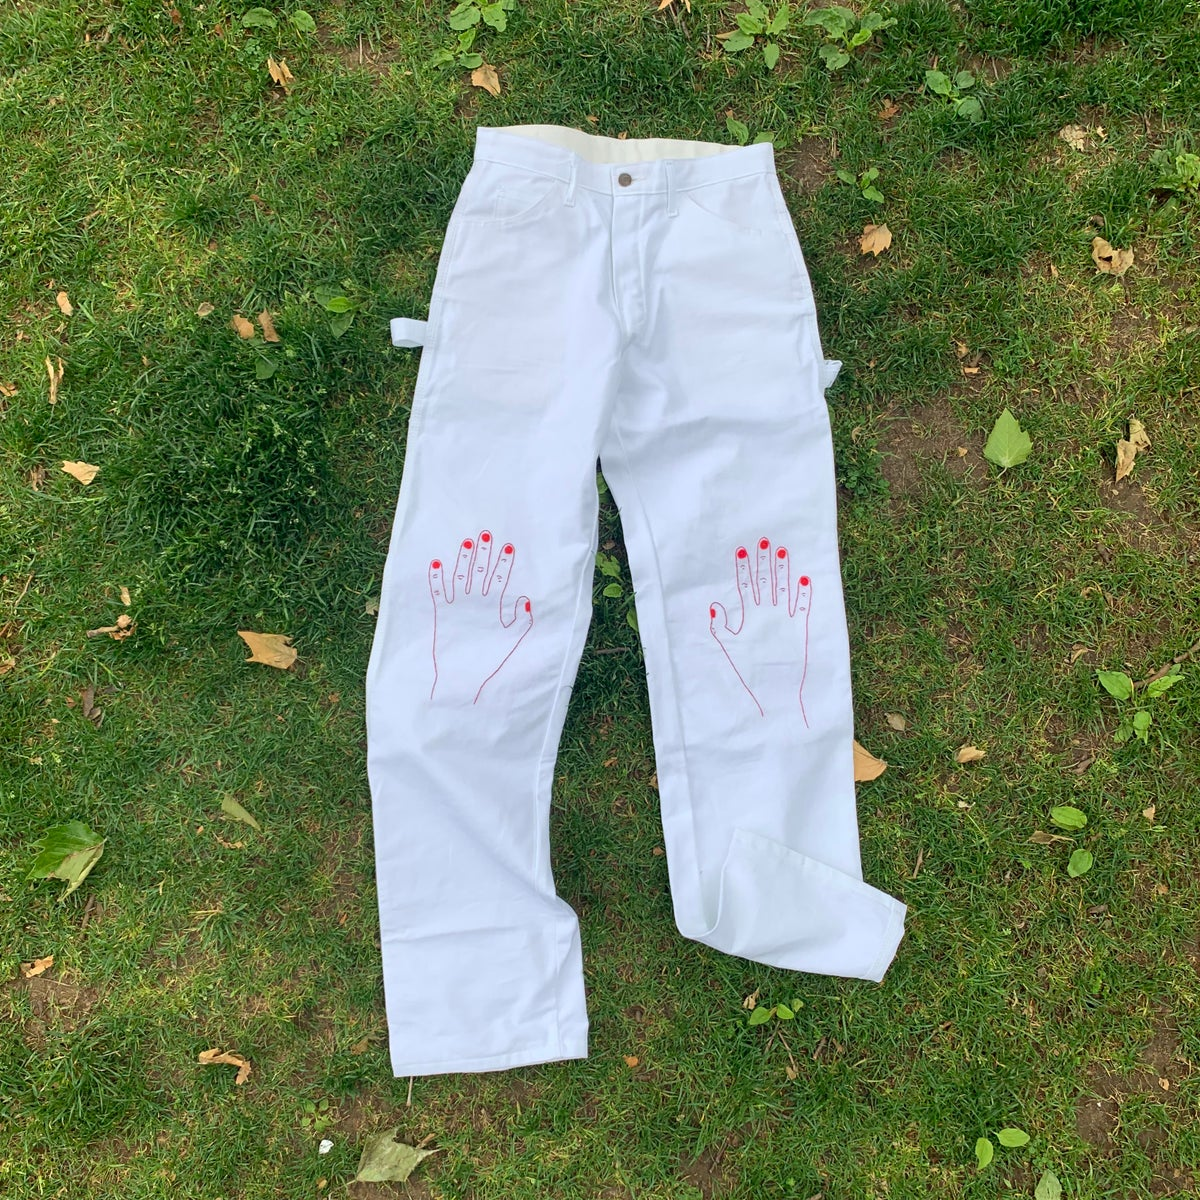 Image of Dickies Painter Hand Pants